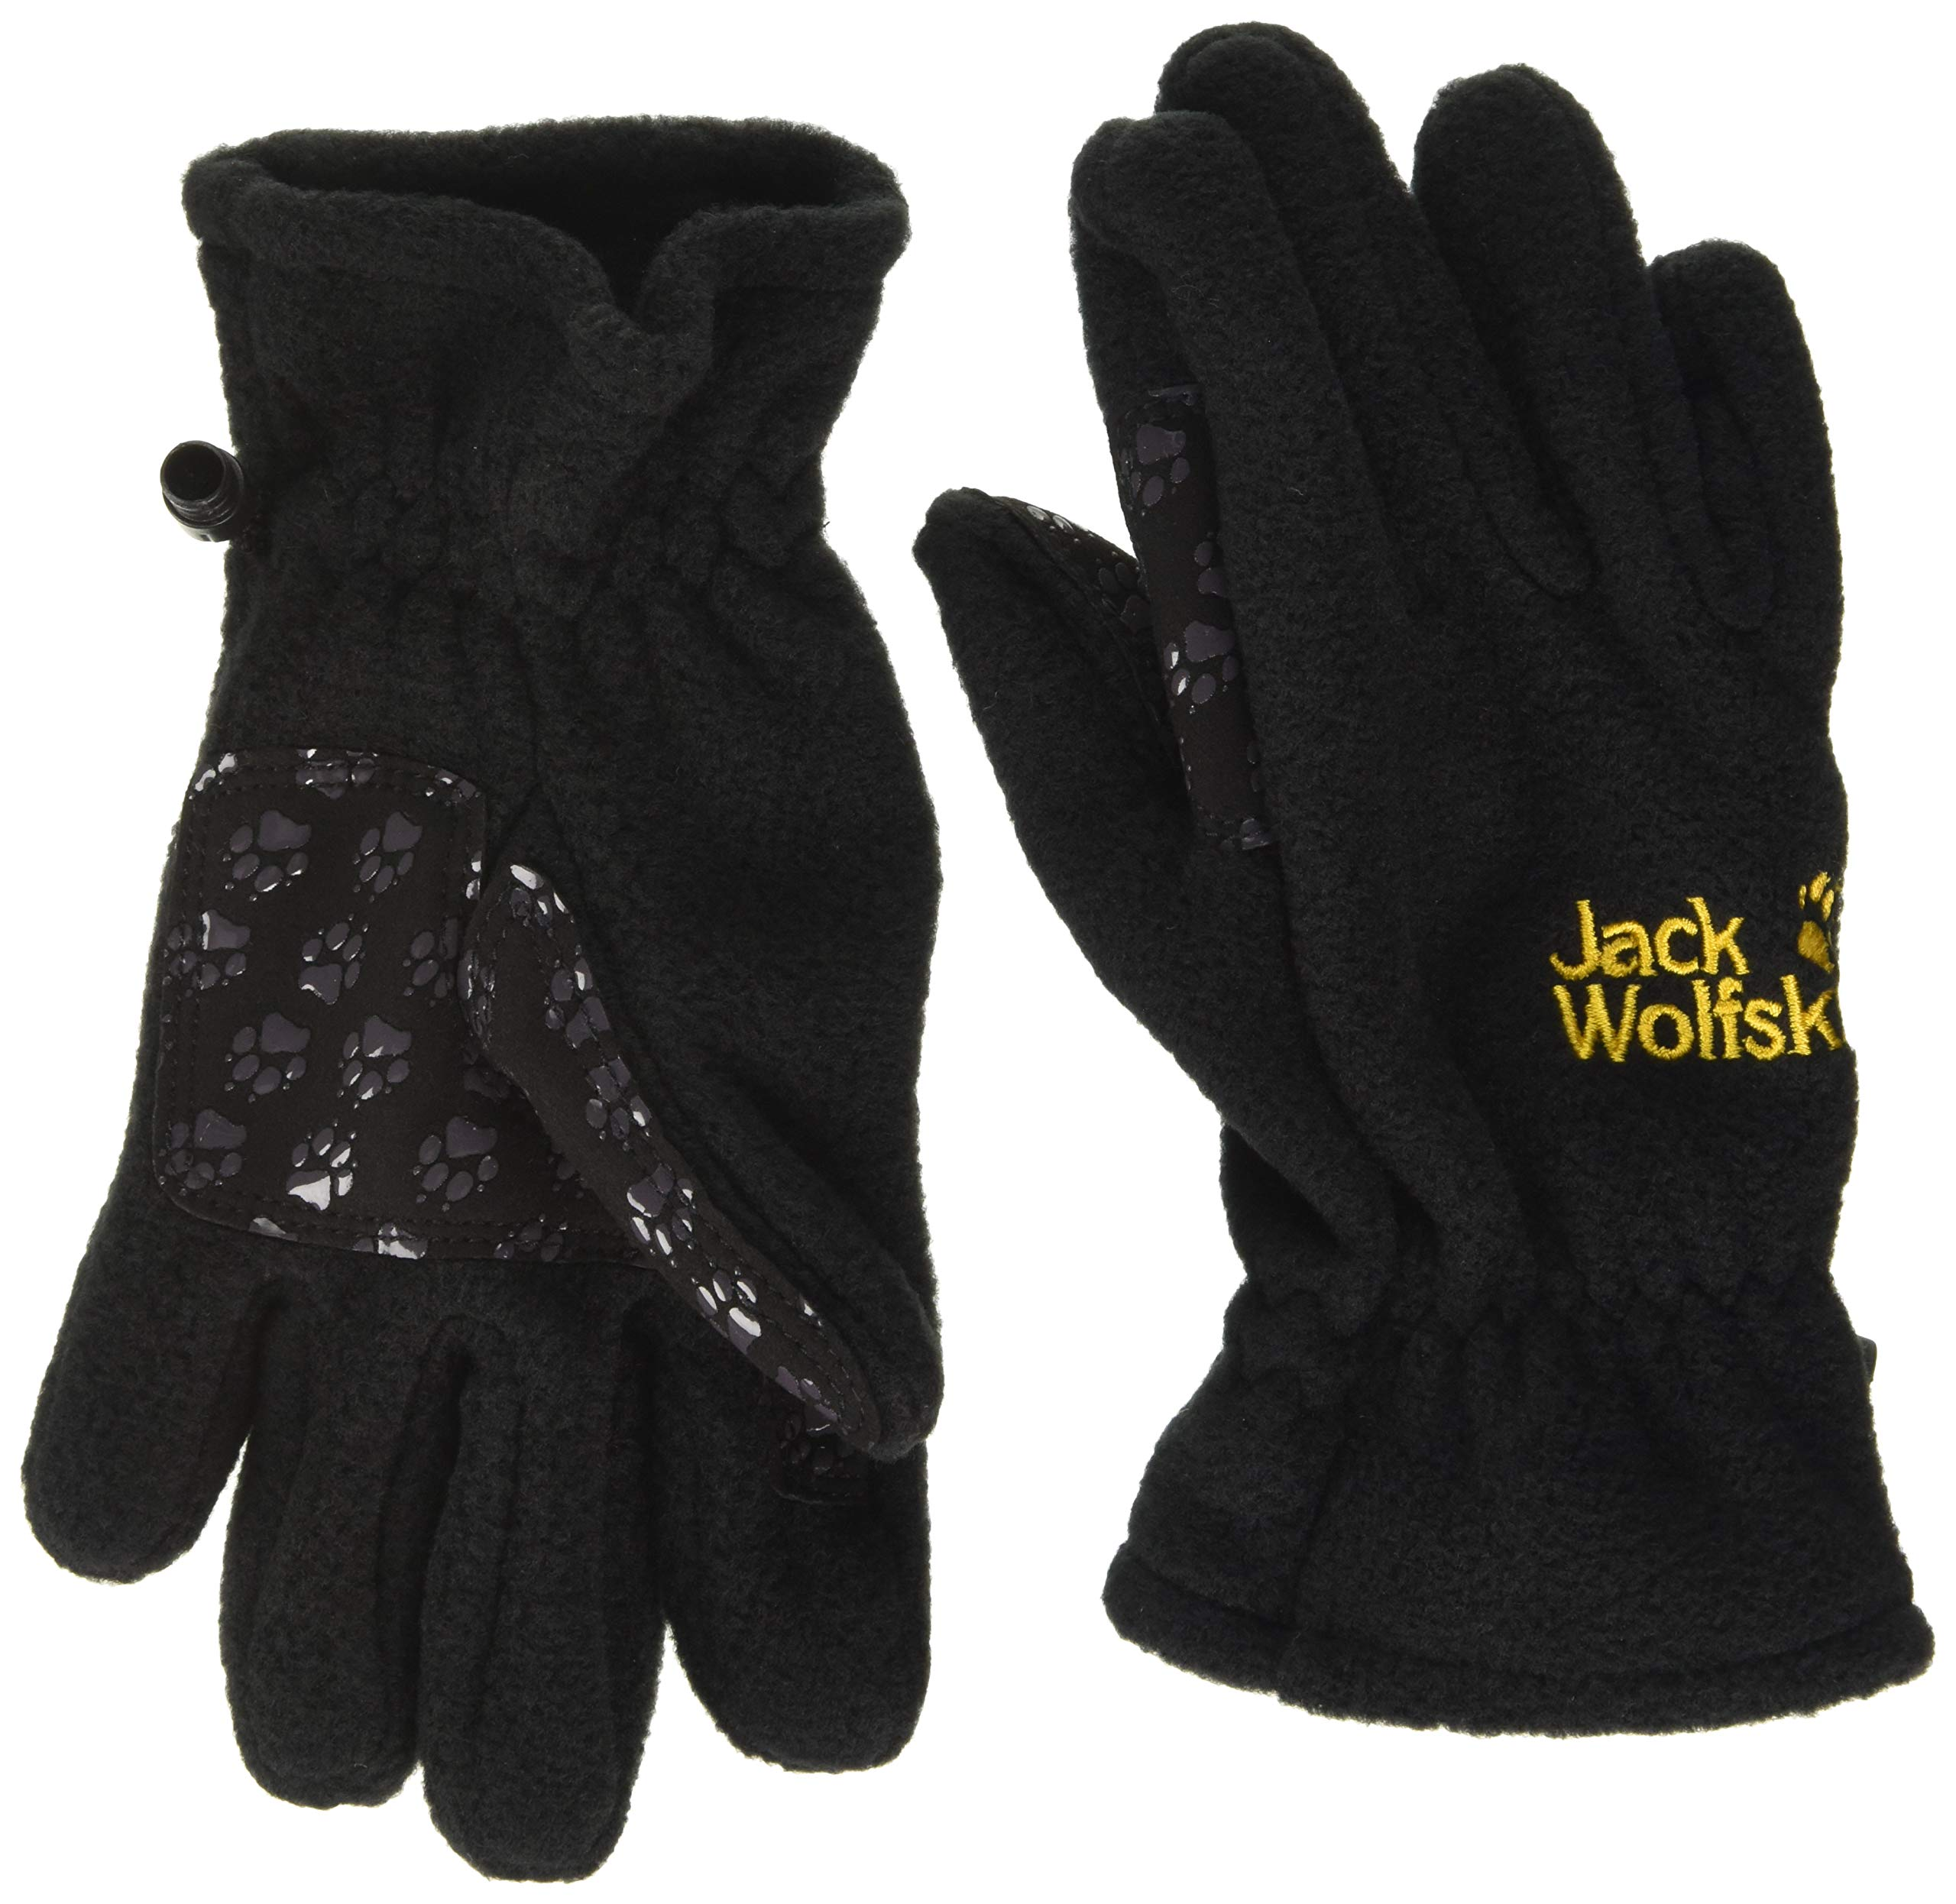 Jack Wolfskin Unisex - Kinder Handschuhe Fleece, black, 152, 1901861-6000152